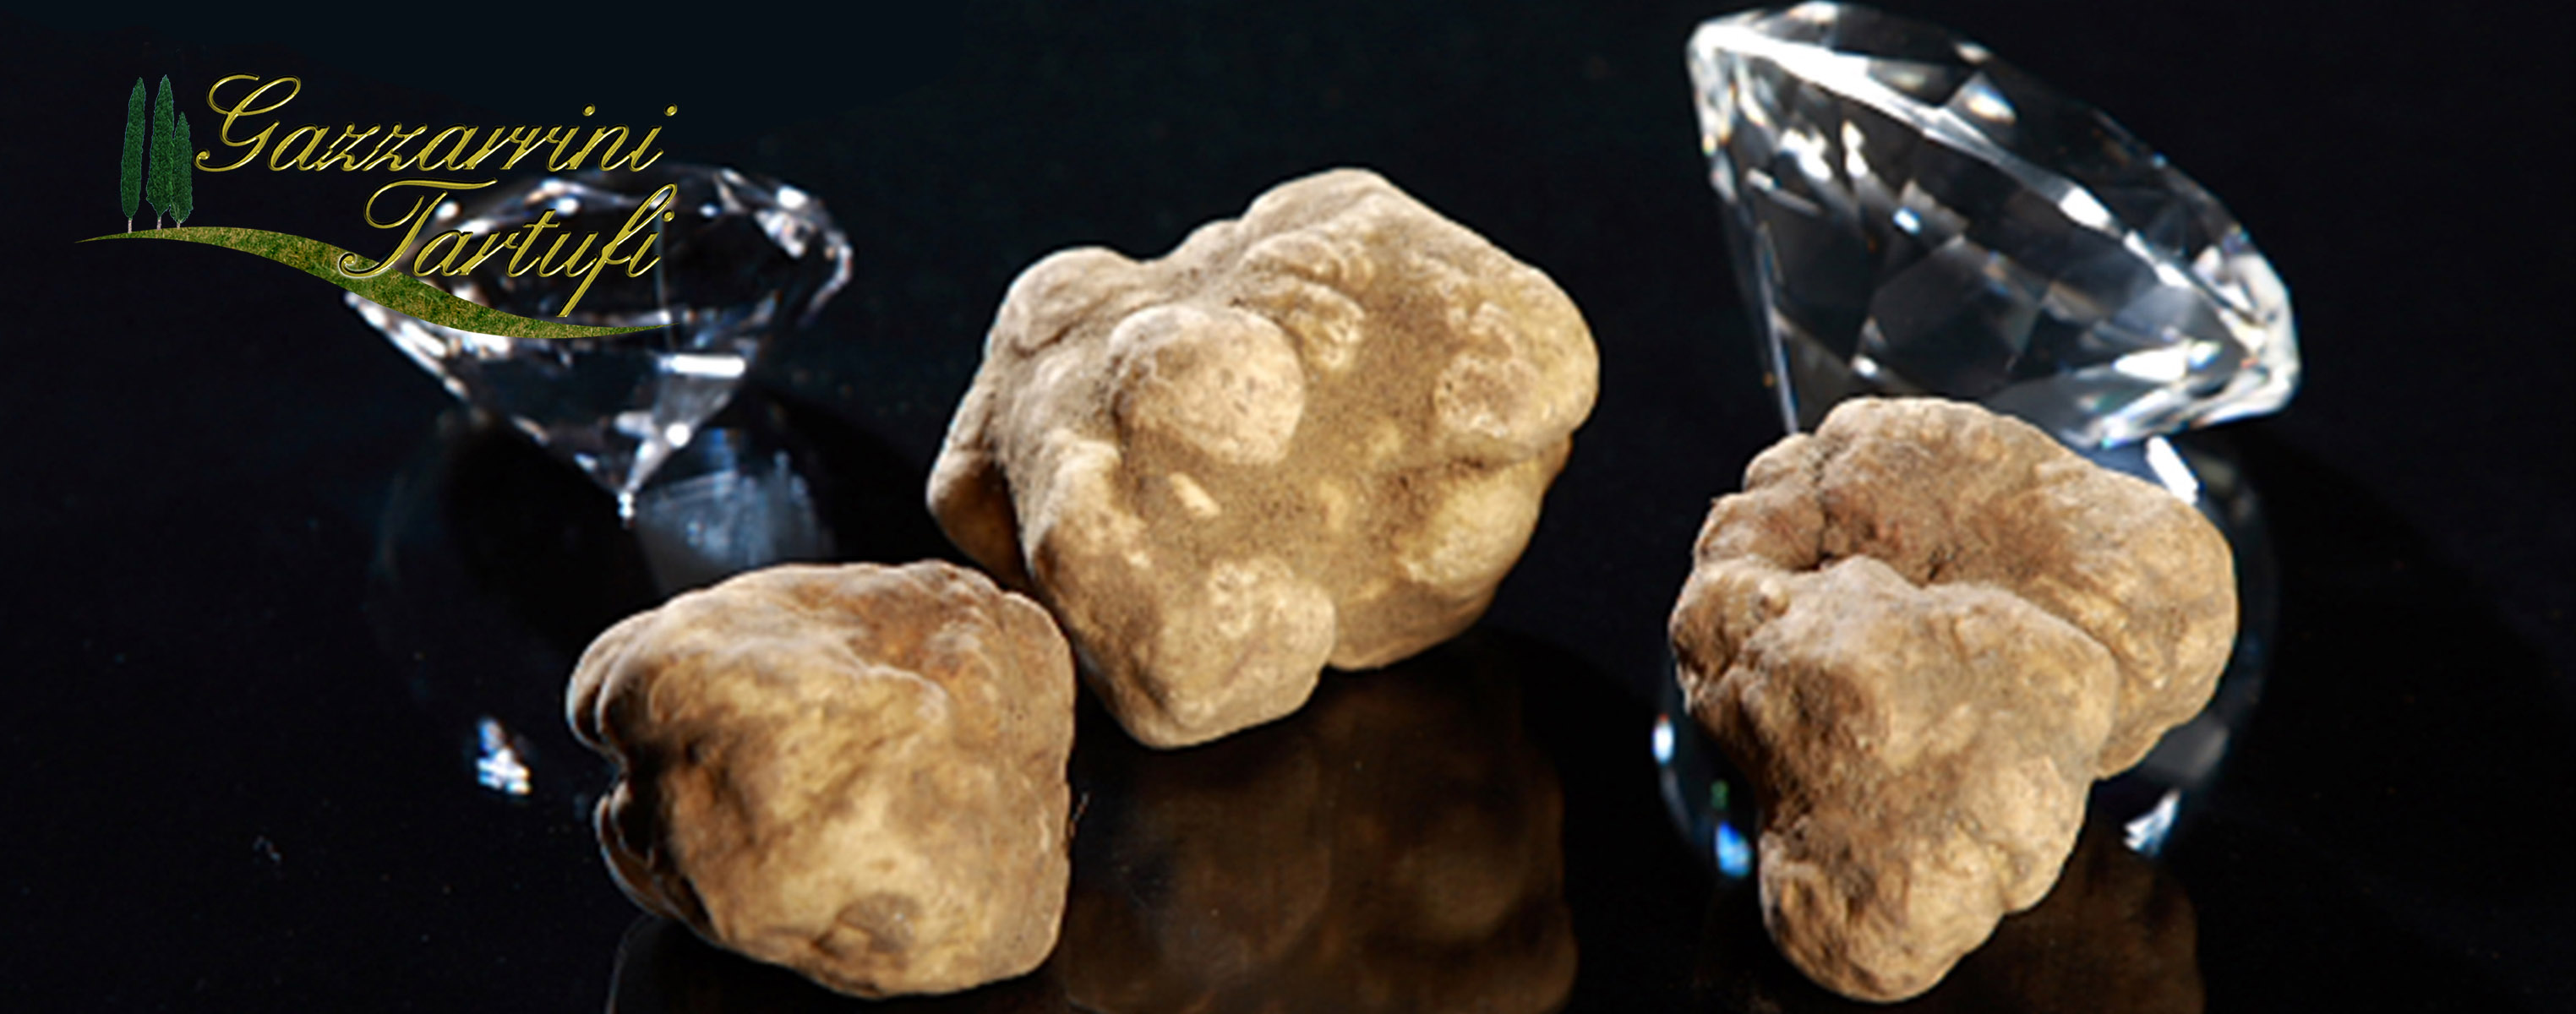 Tartufi di san miniato, Tartufo e diamanti